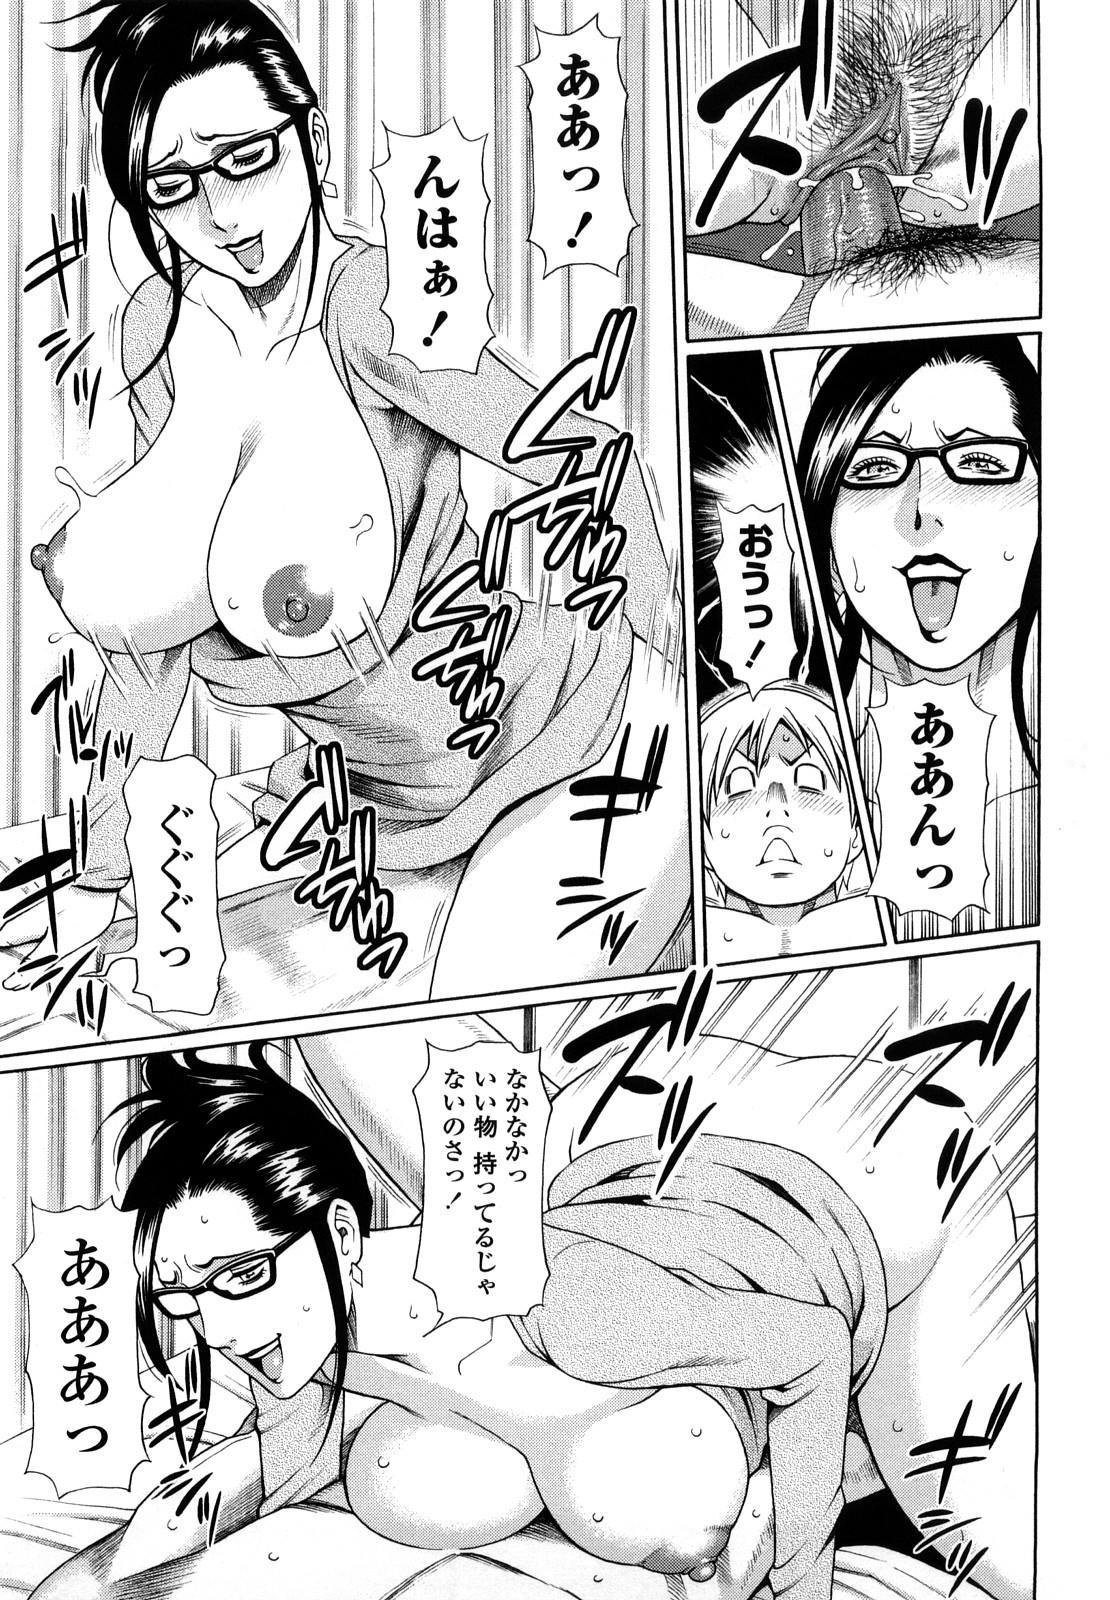 [Takasugi Kou] Kindan no Haha-Ana - Immorality Love-Hole [Decensored] 164